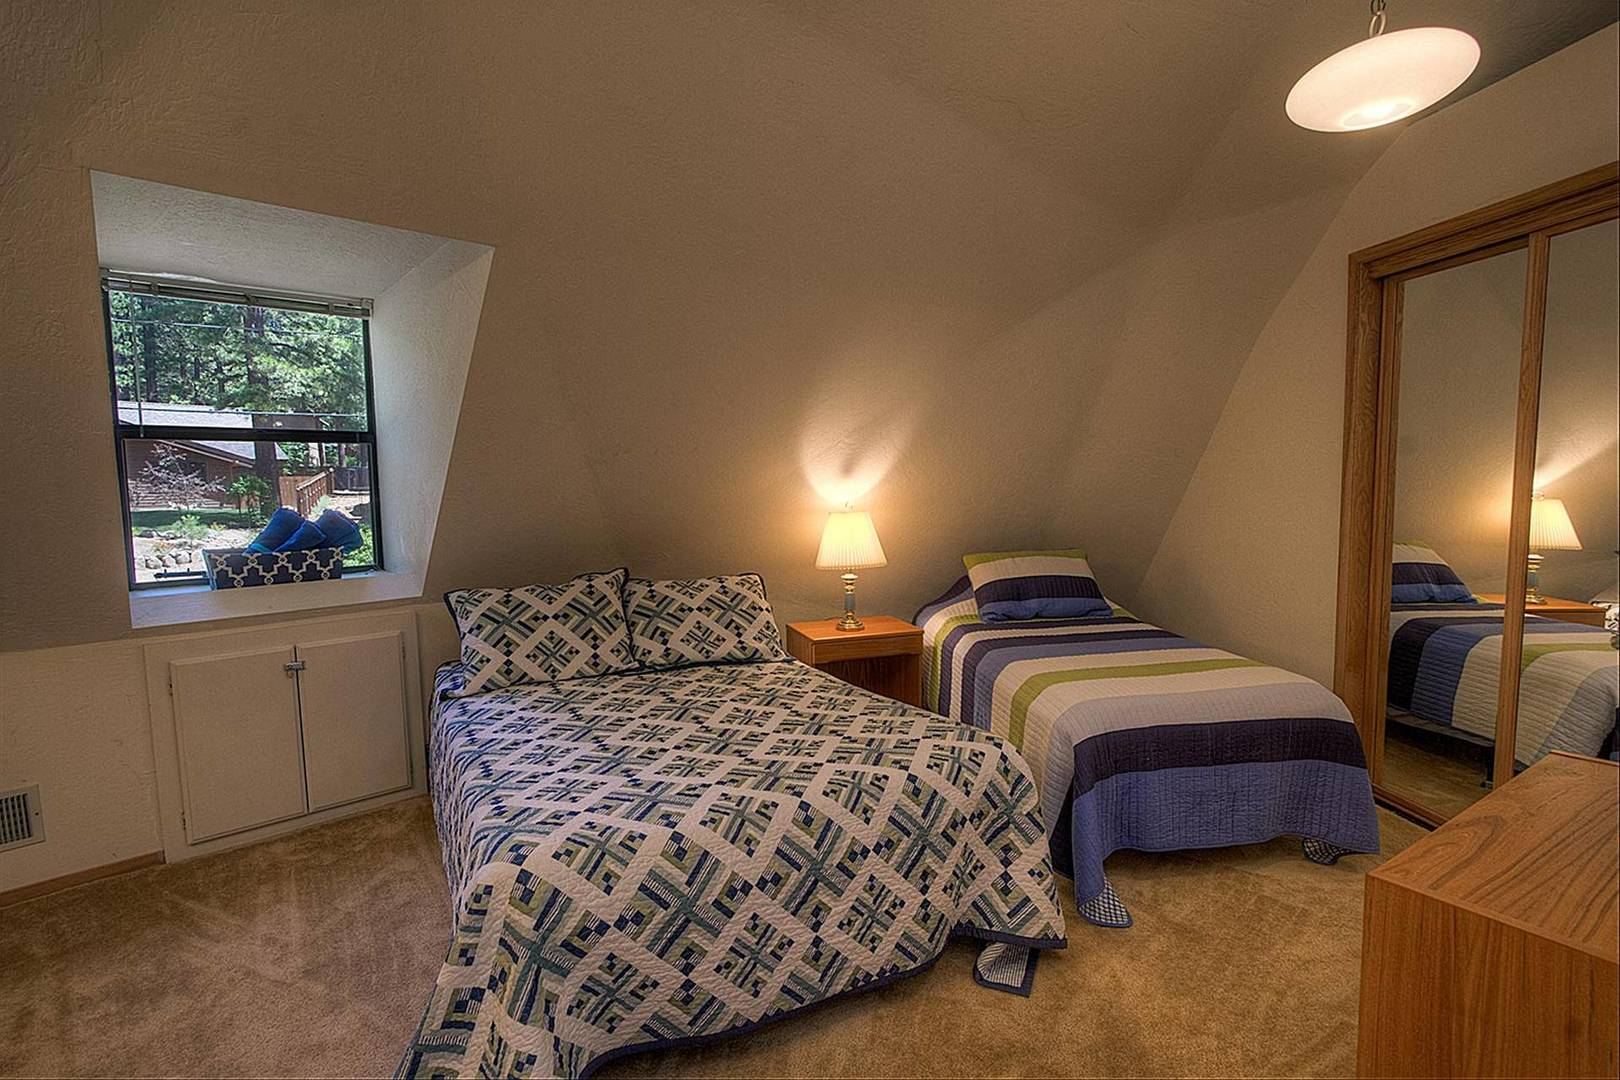 ivh1159 bedroom